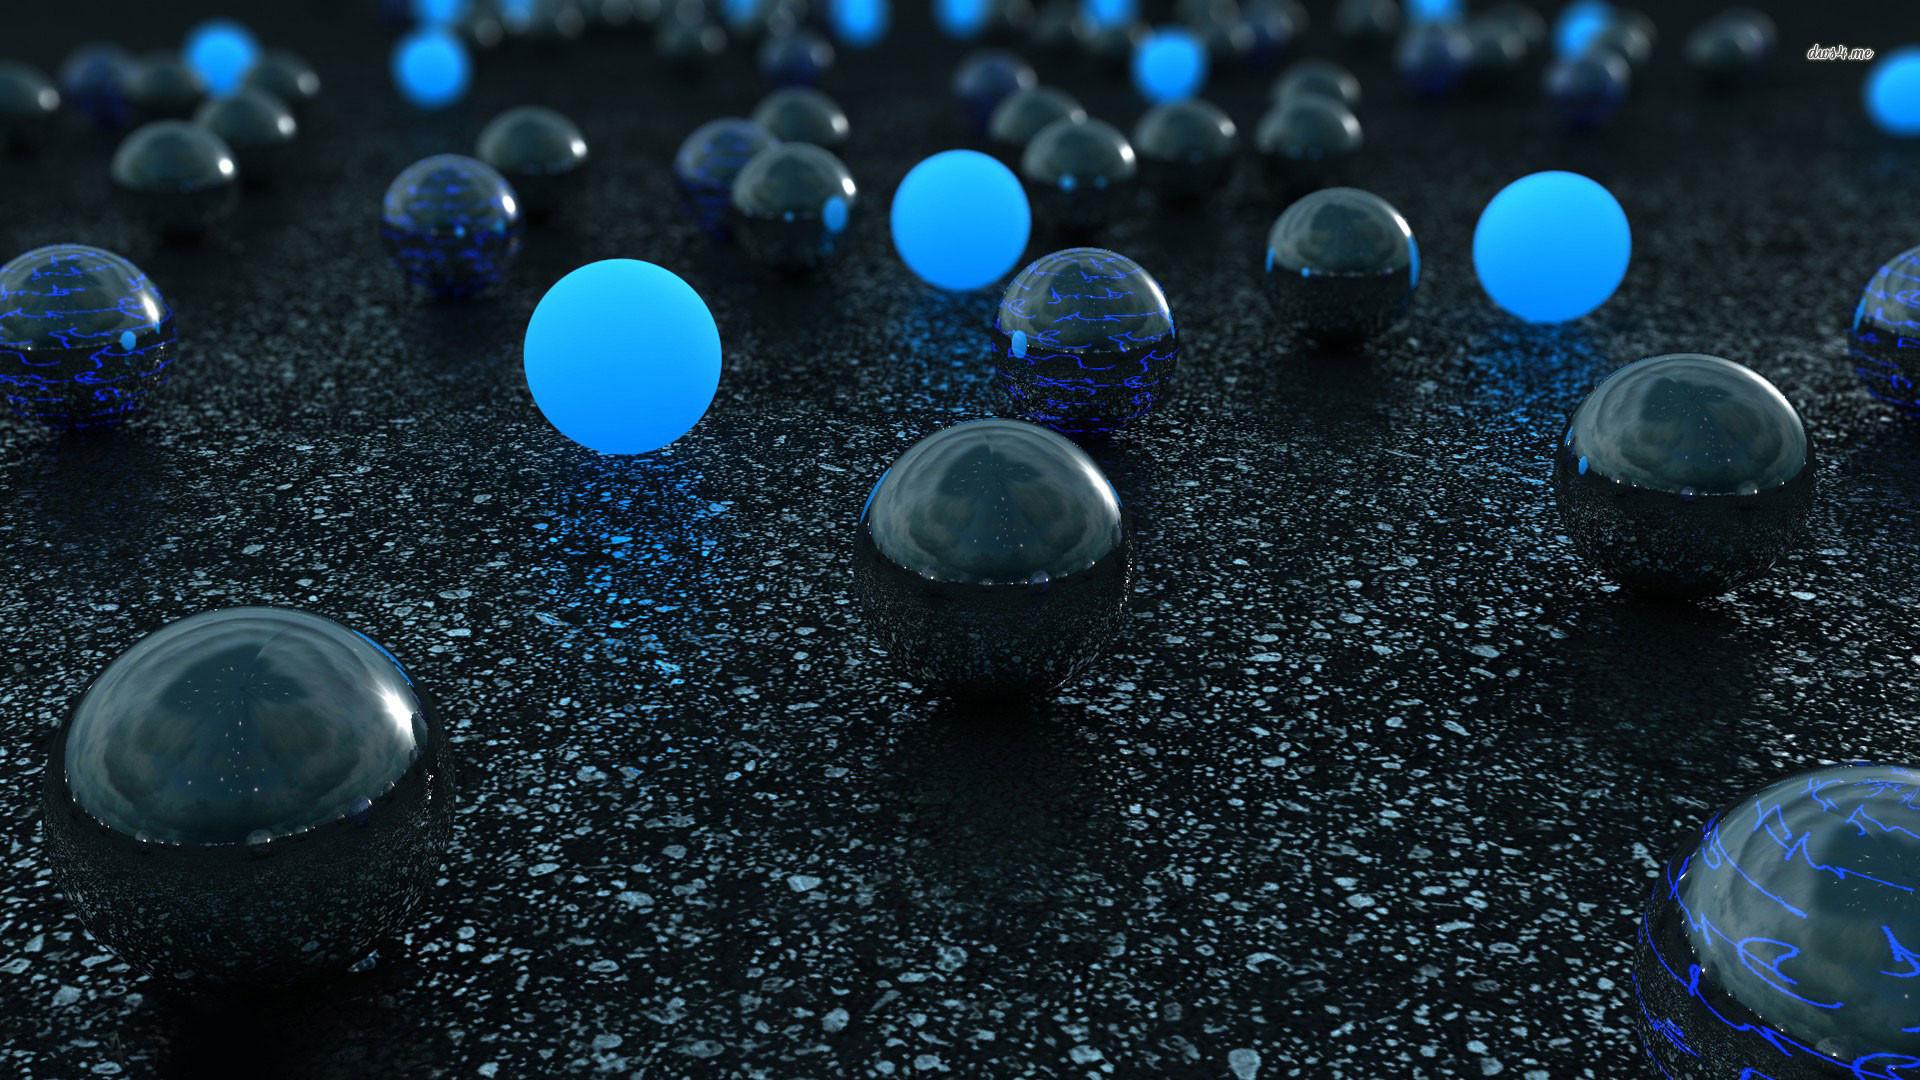 hd pics photos 3d spheres blue black technology wallpaper